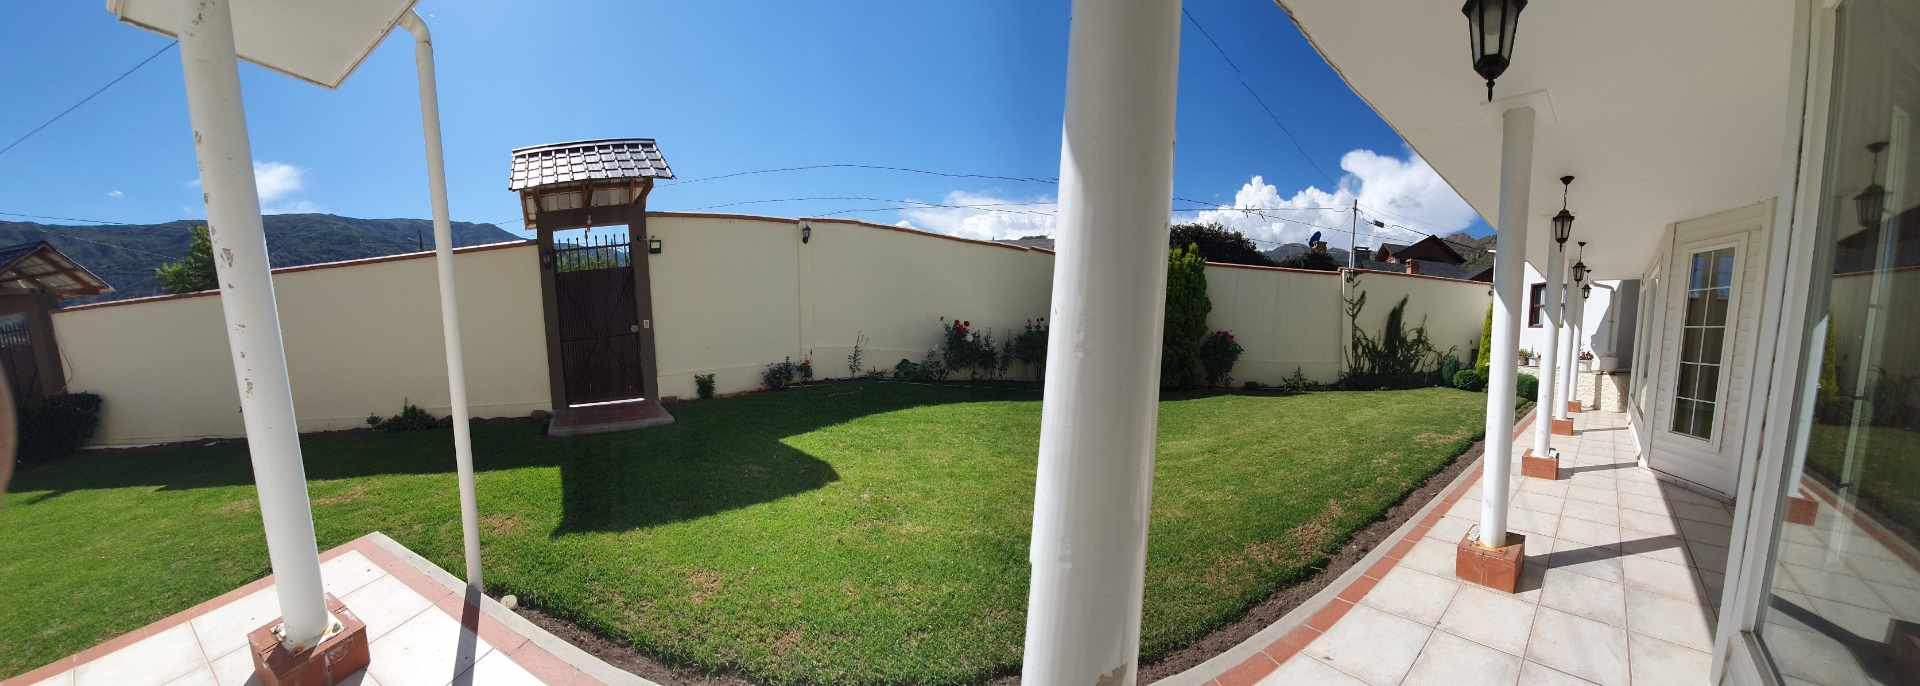 Casa en Venta Zona Sur, Huajchilla. Urbanizacion Bartos. Foto 8